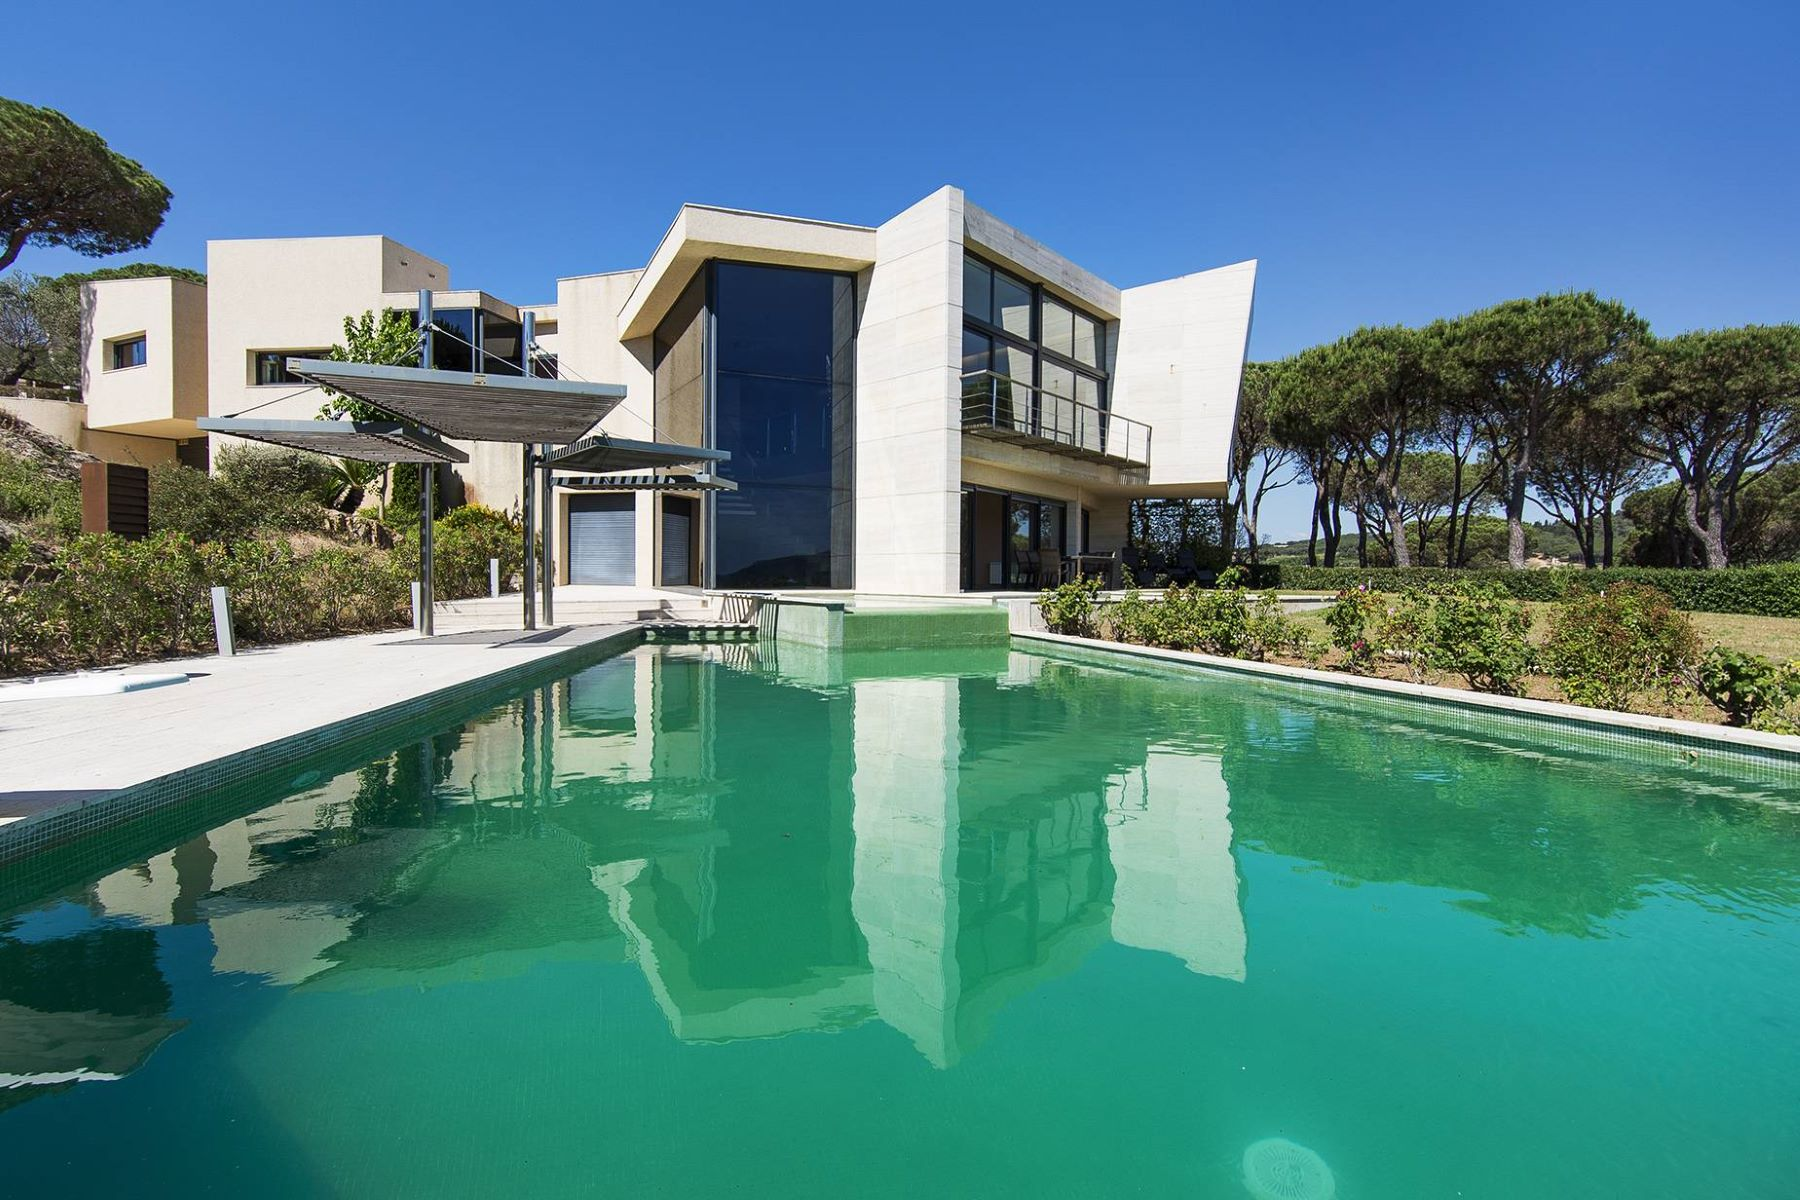 Single Family Home for Sale at Fantastic villa in a quiet urbanization Sant Feliu De Guixols, Costa Brava, 17220 Spain